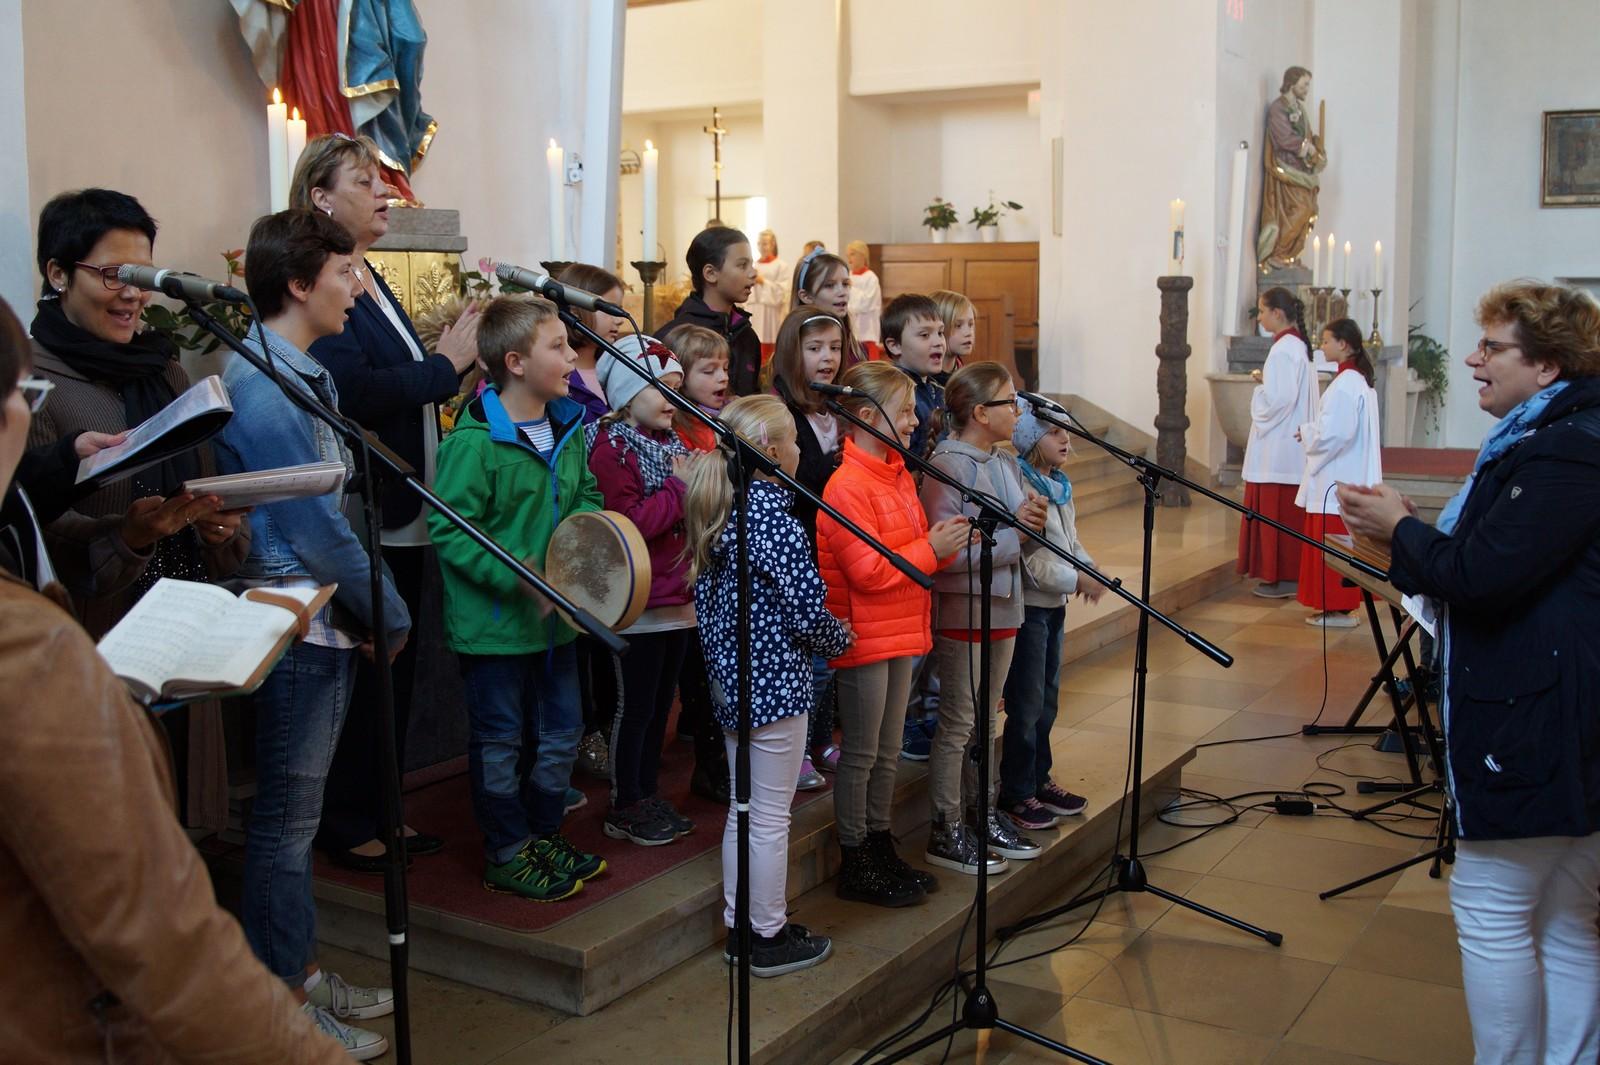 20180930-Erntedank Pfarrei Schwarzenfeld mit Gruppen Piccolo und ContactDSC03446